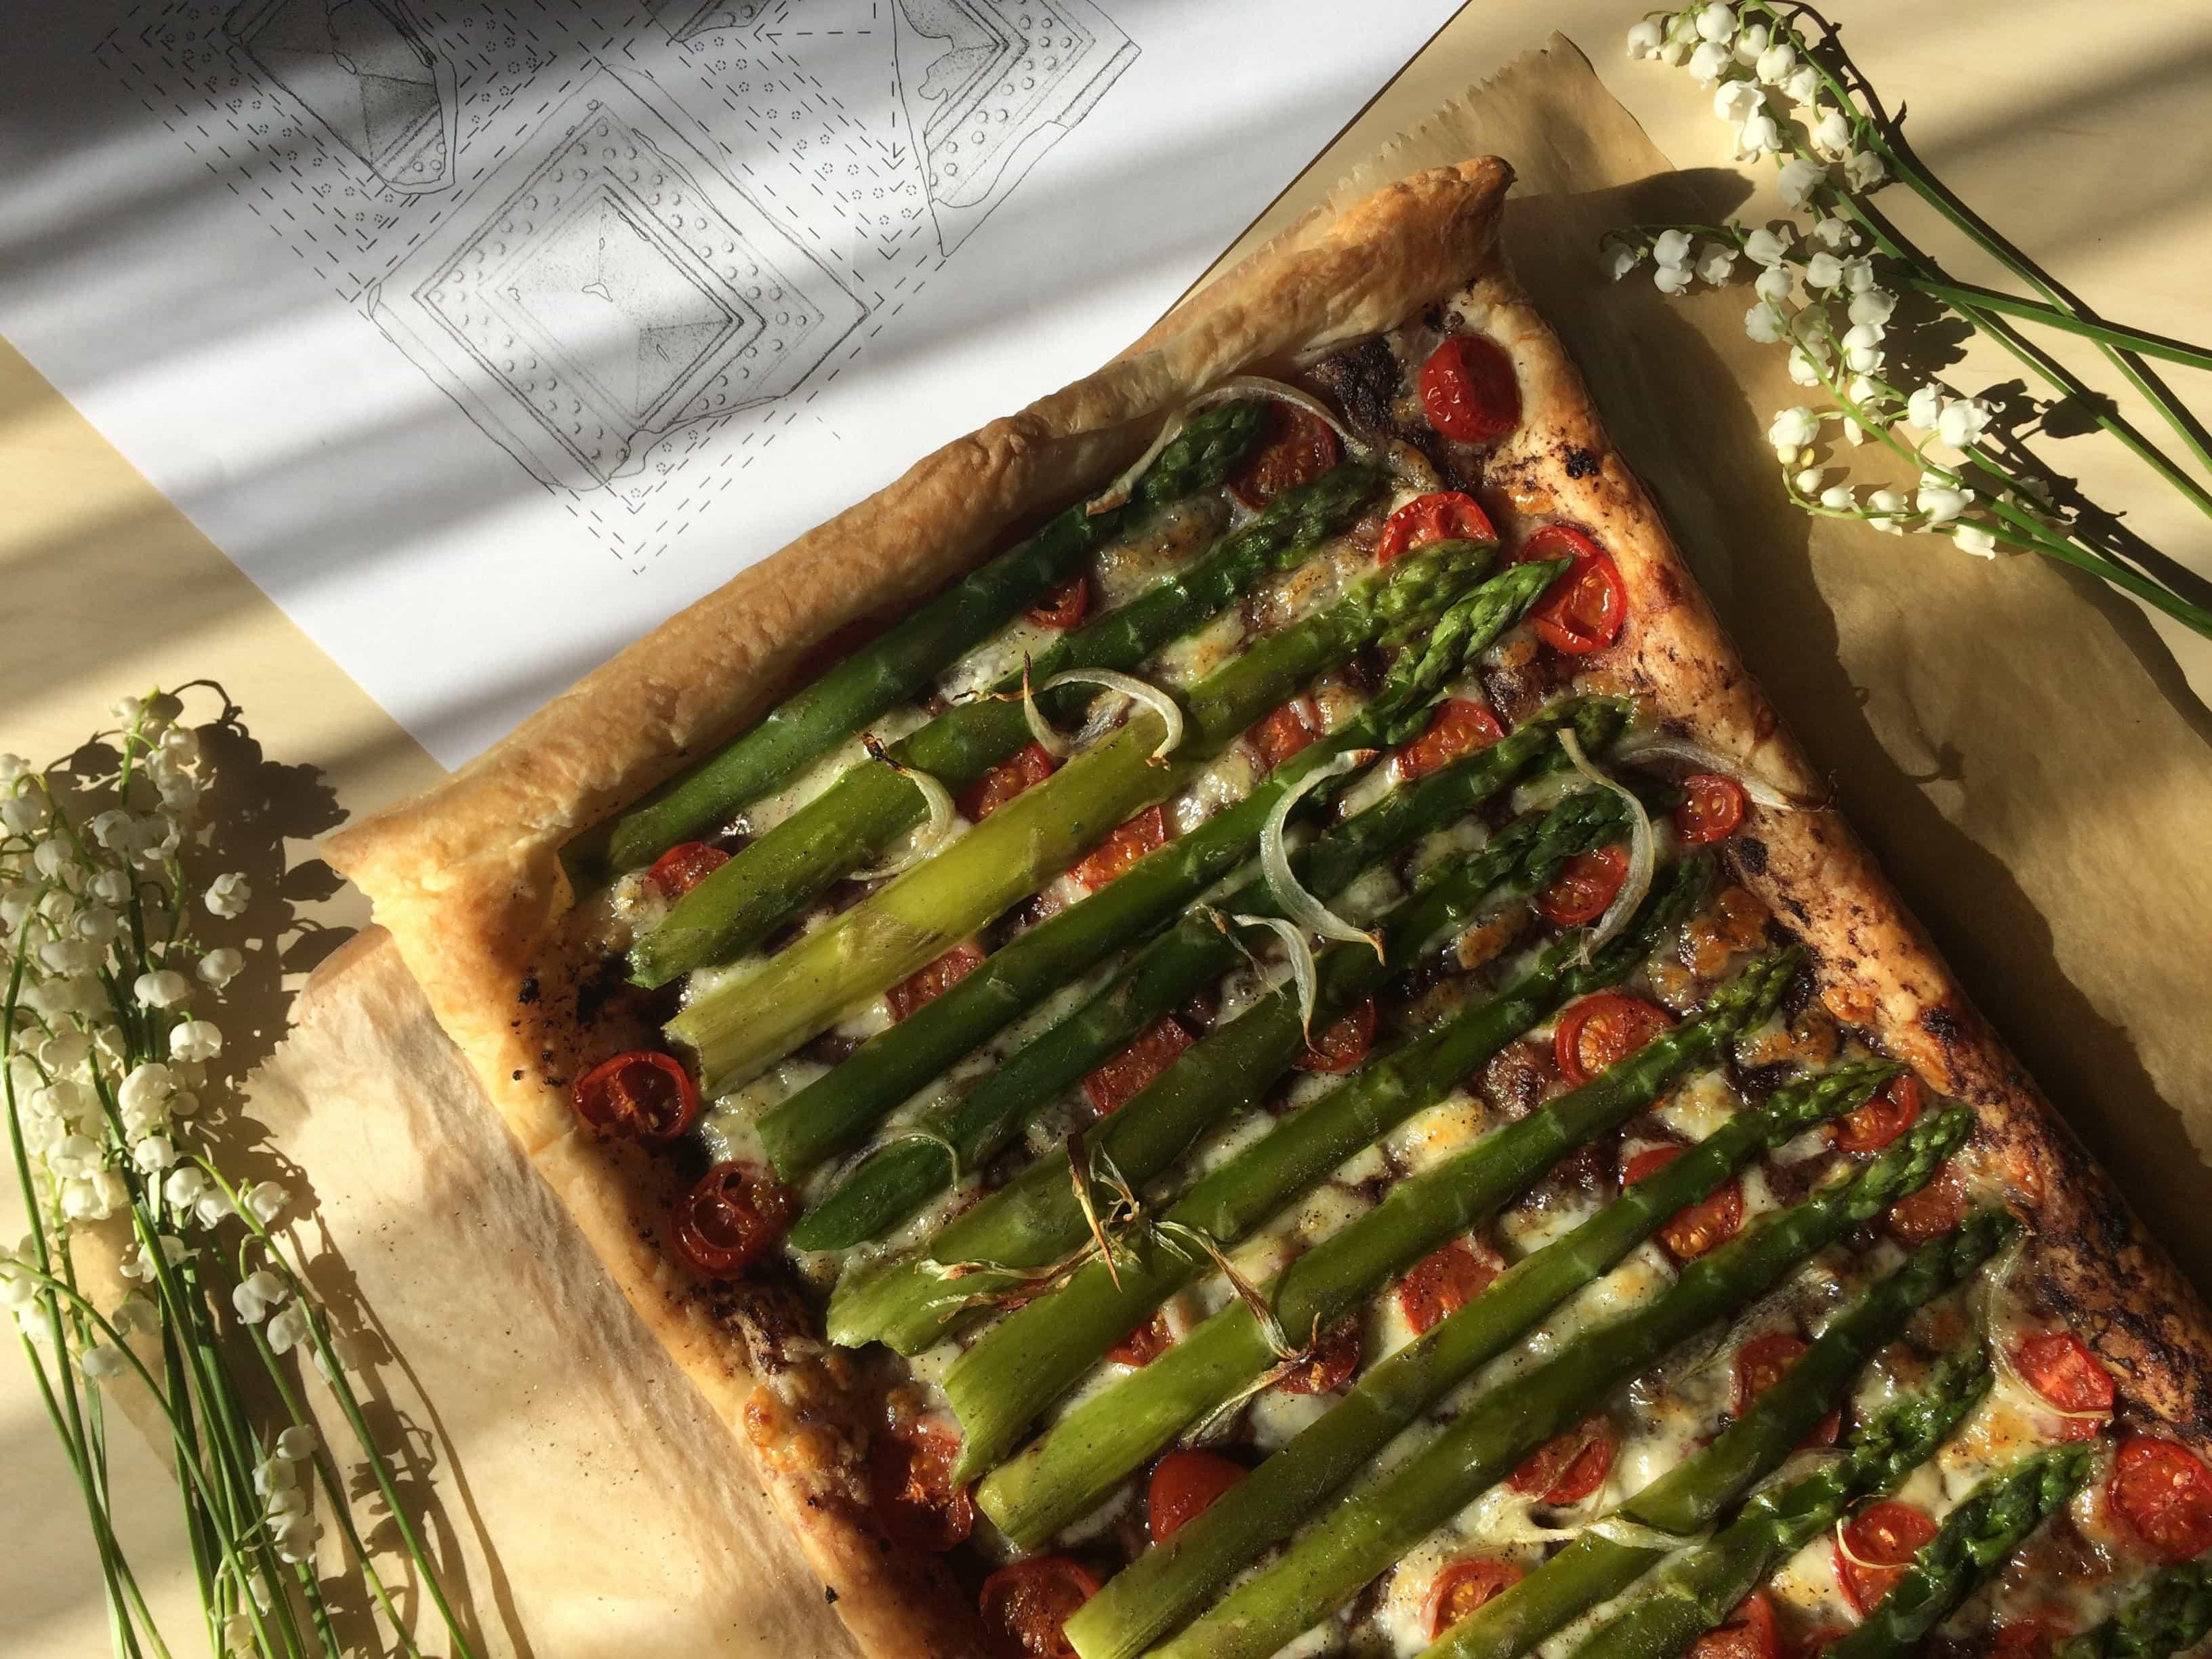 Zielone szparagi cieście francuskim green asparagus puff pastry